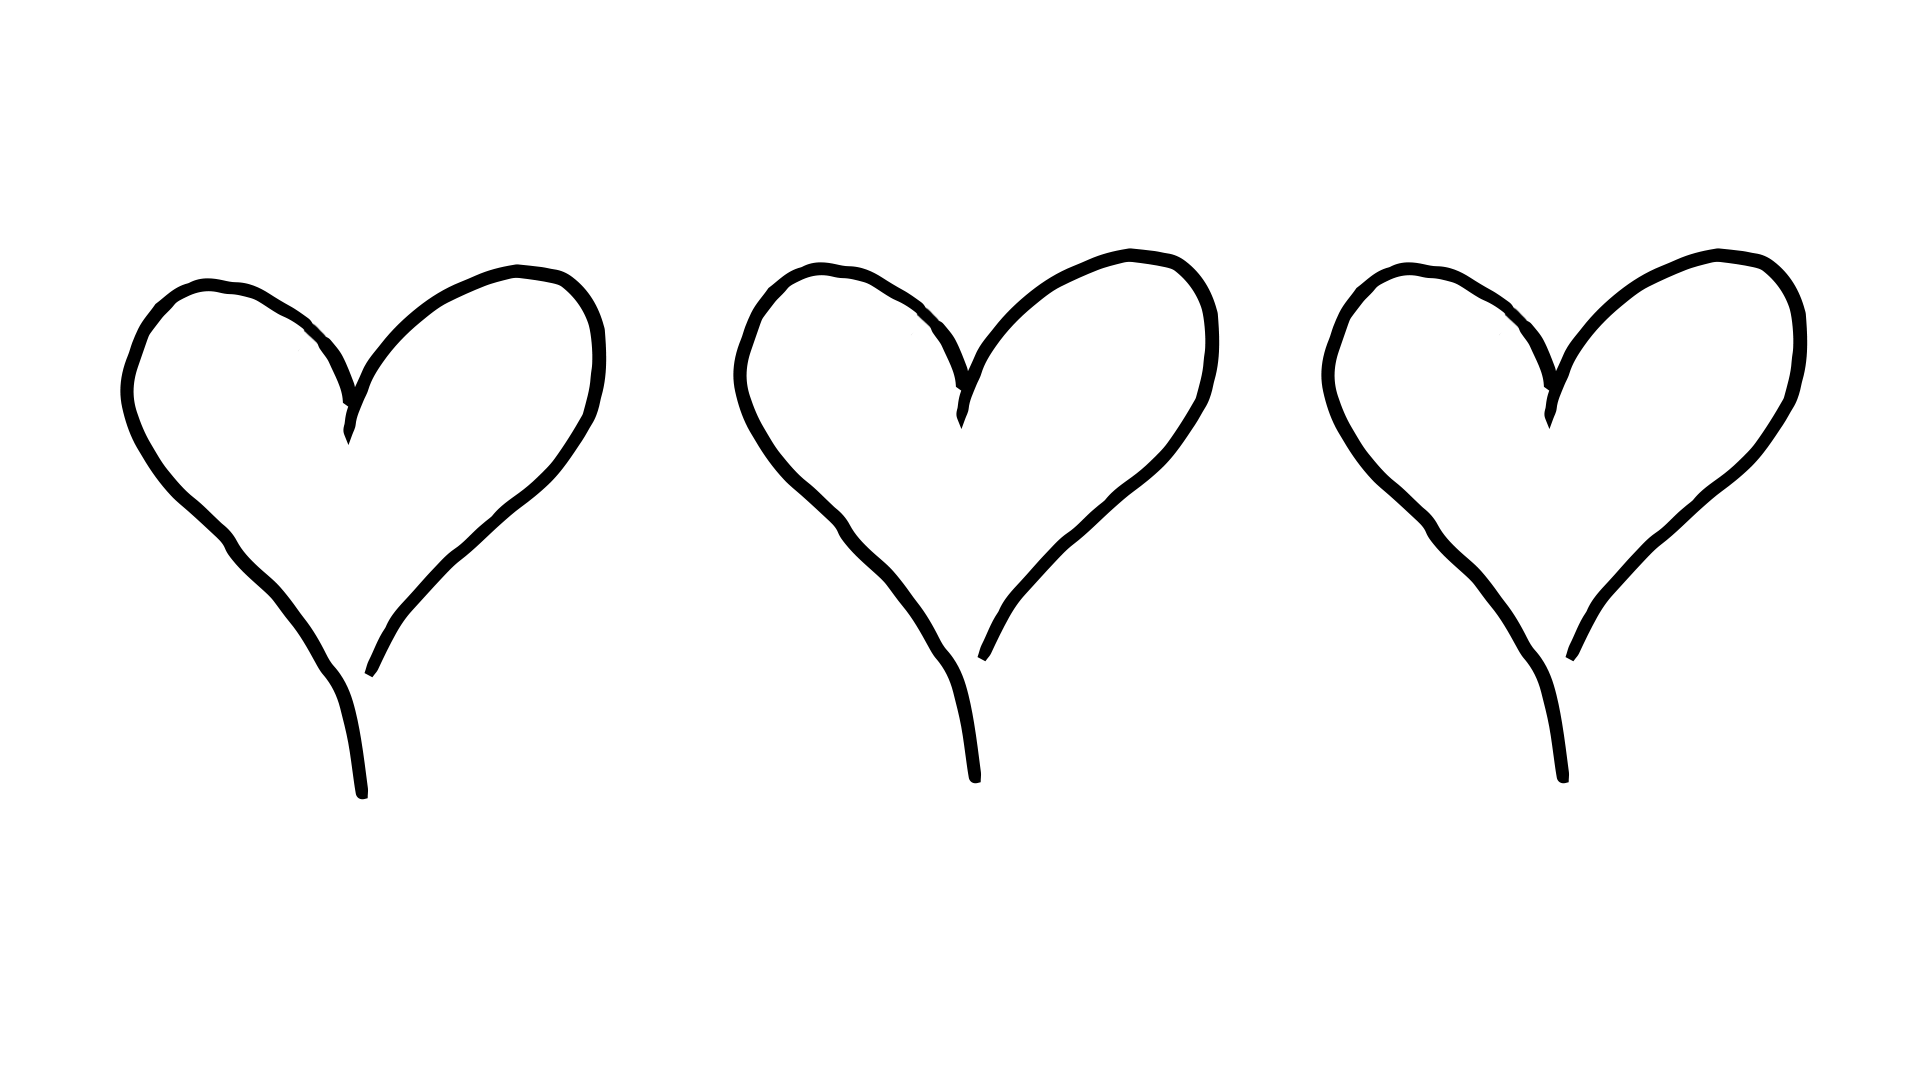 Space Joyridin